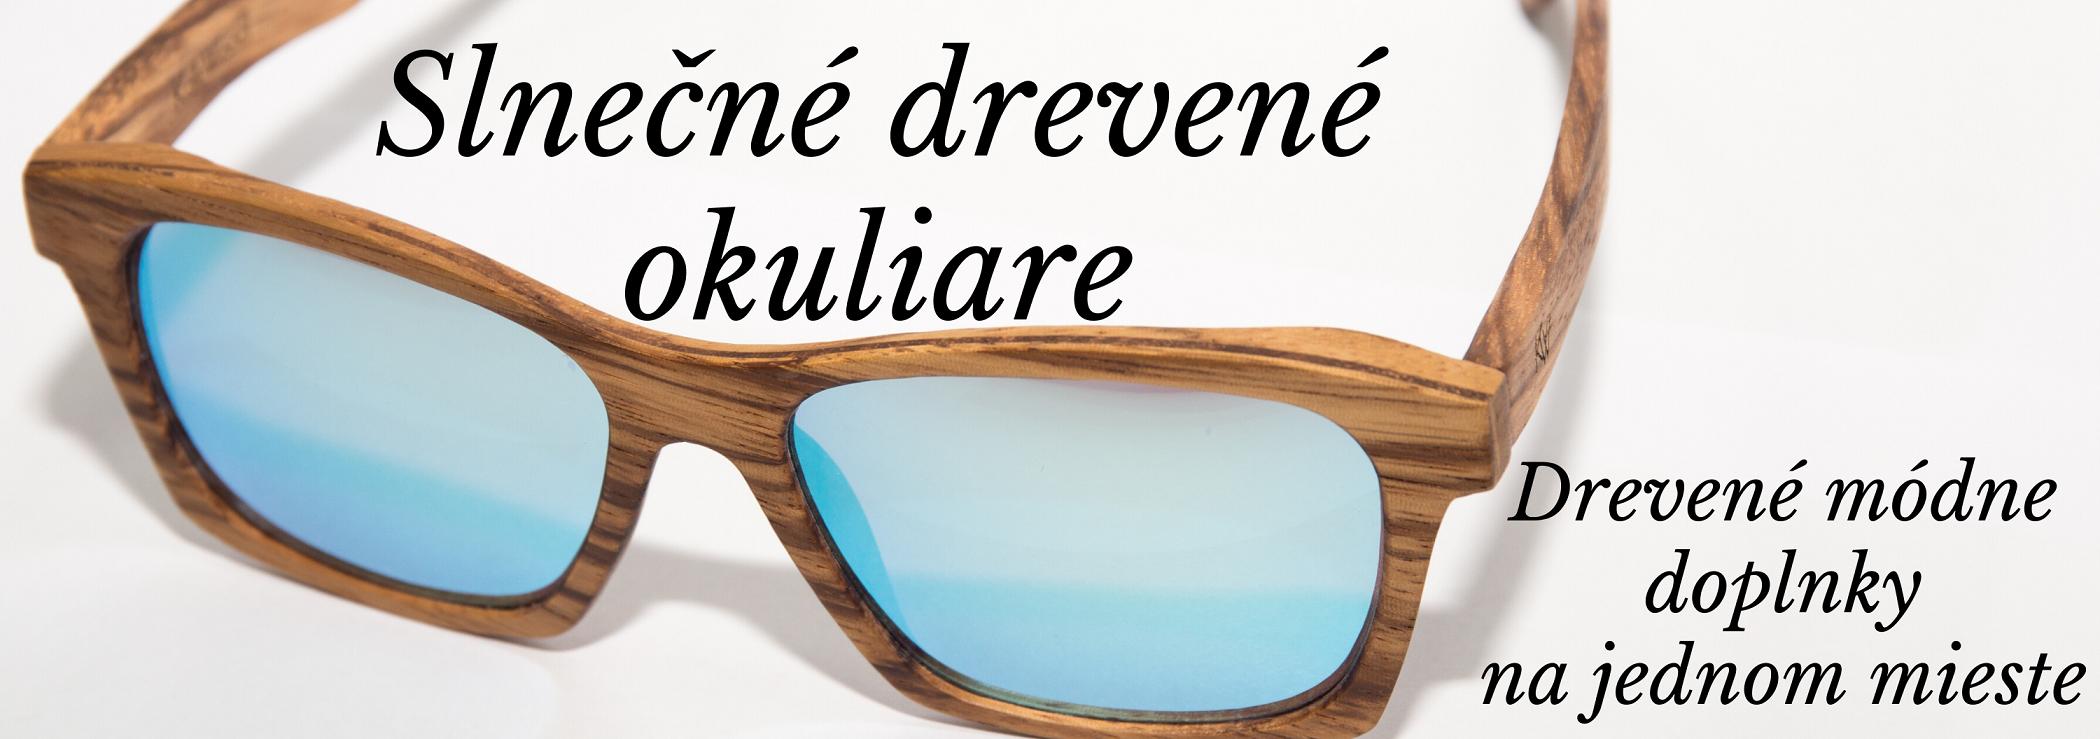 CINGITIME drevené slnečné okuliare